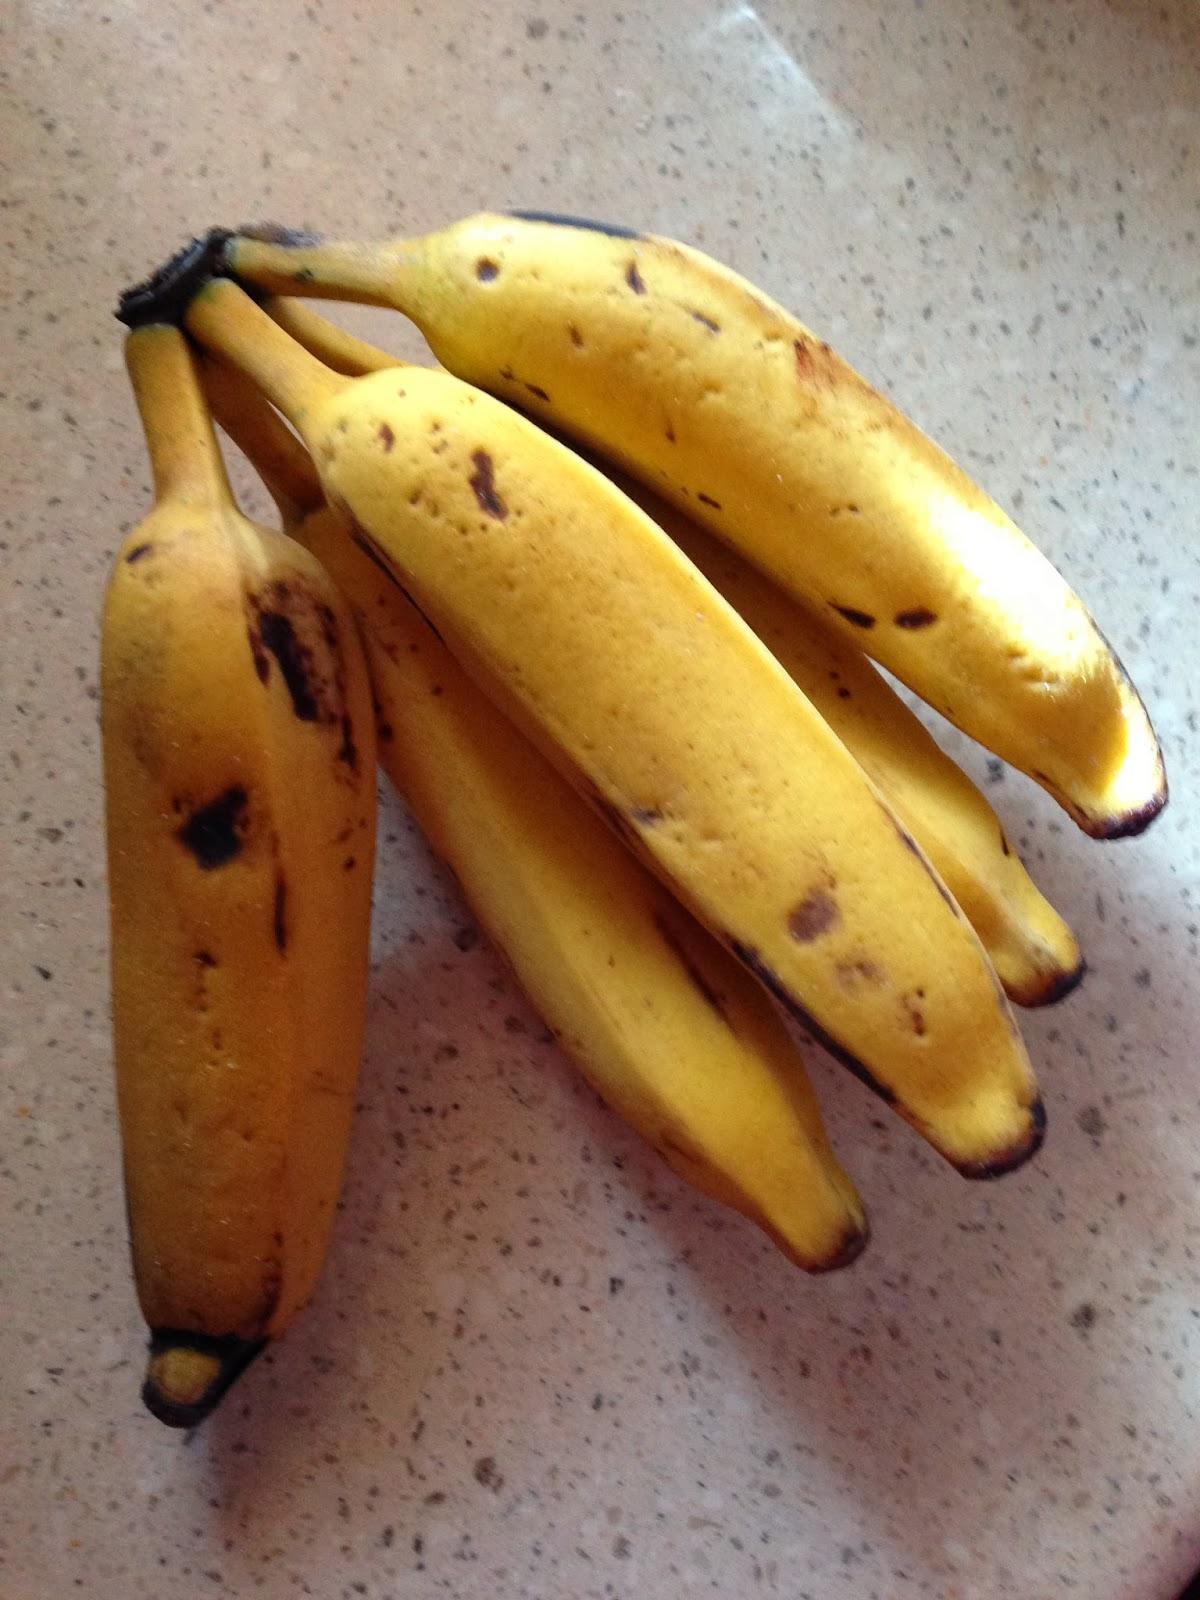 Coconut Tapioca and Apple Banana Pudding